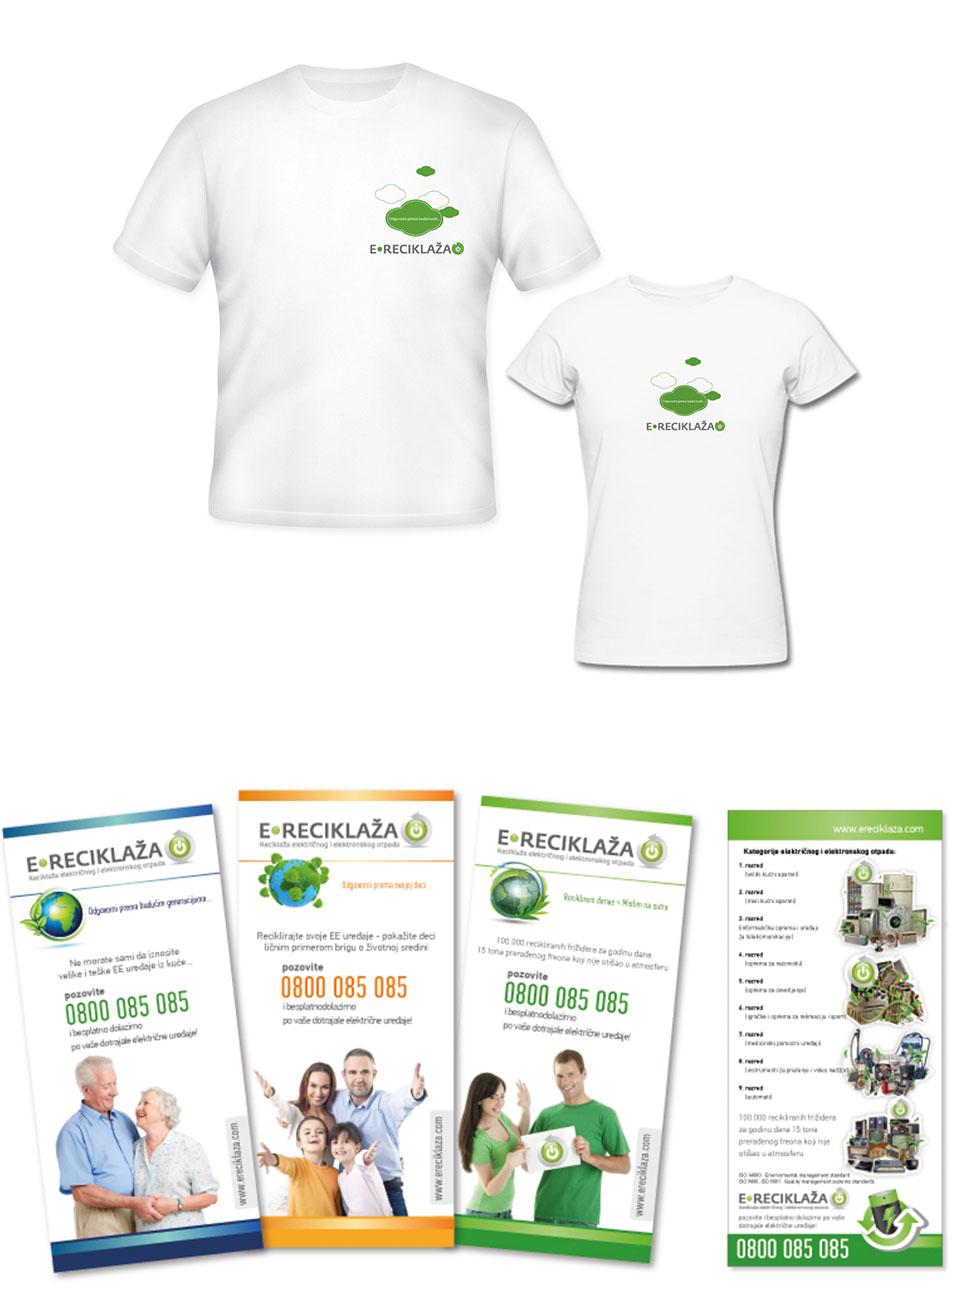 e-reciklaza promo materijal 2